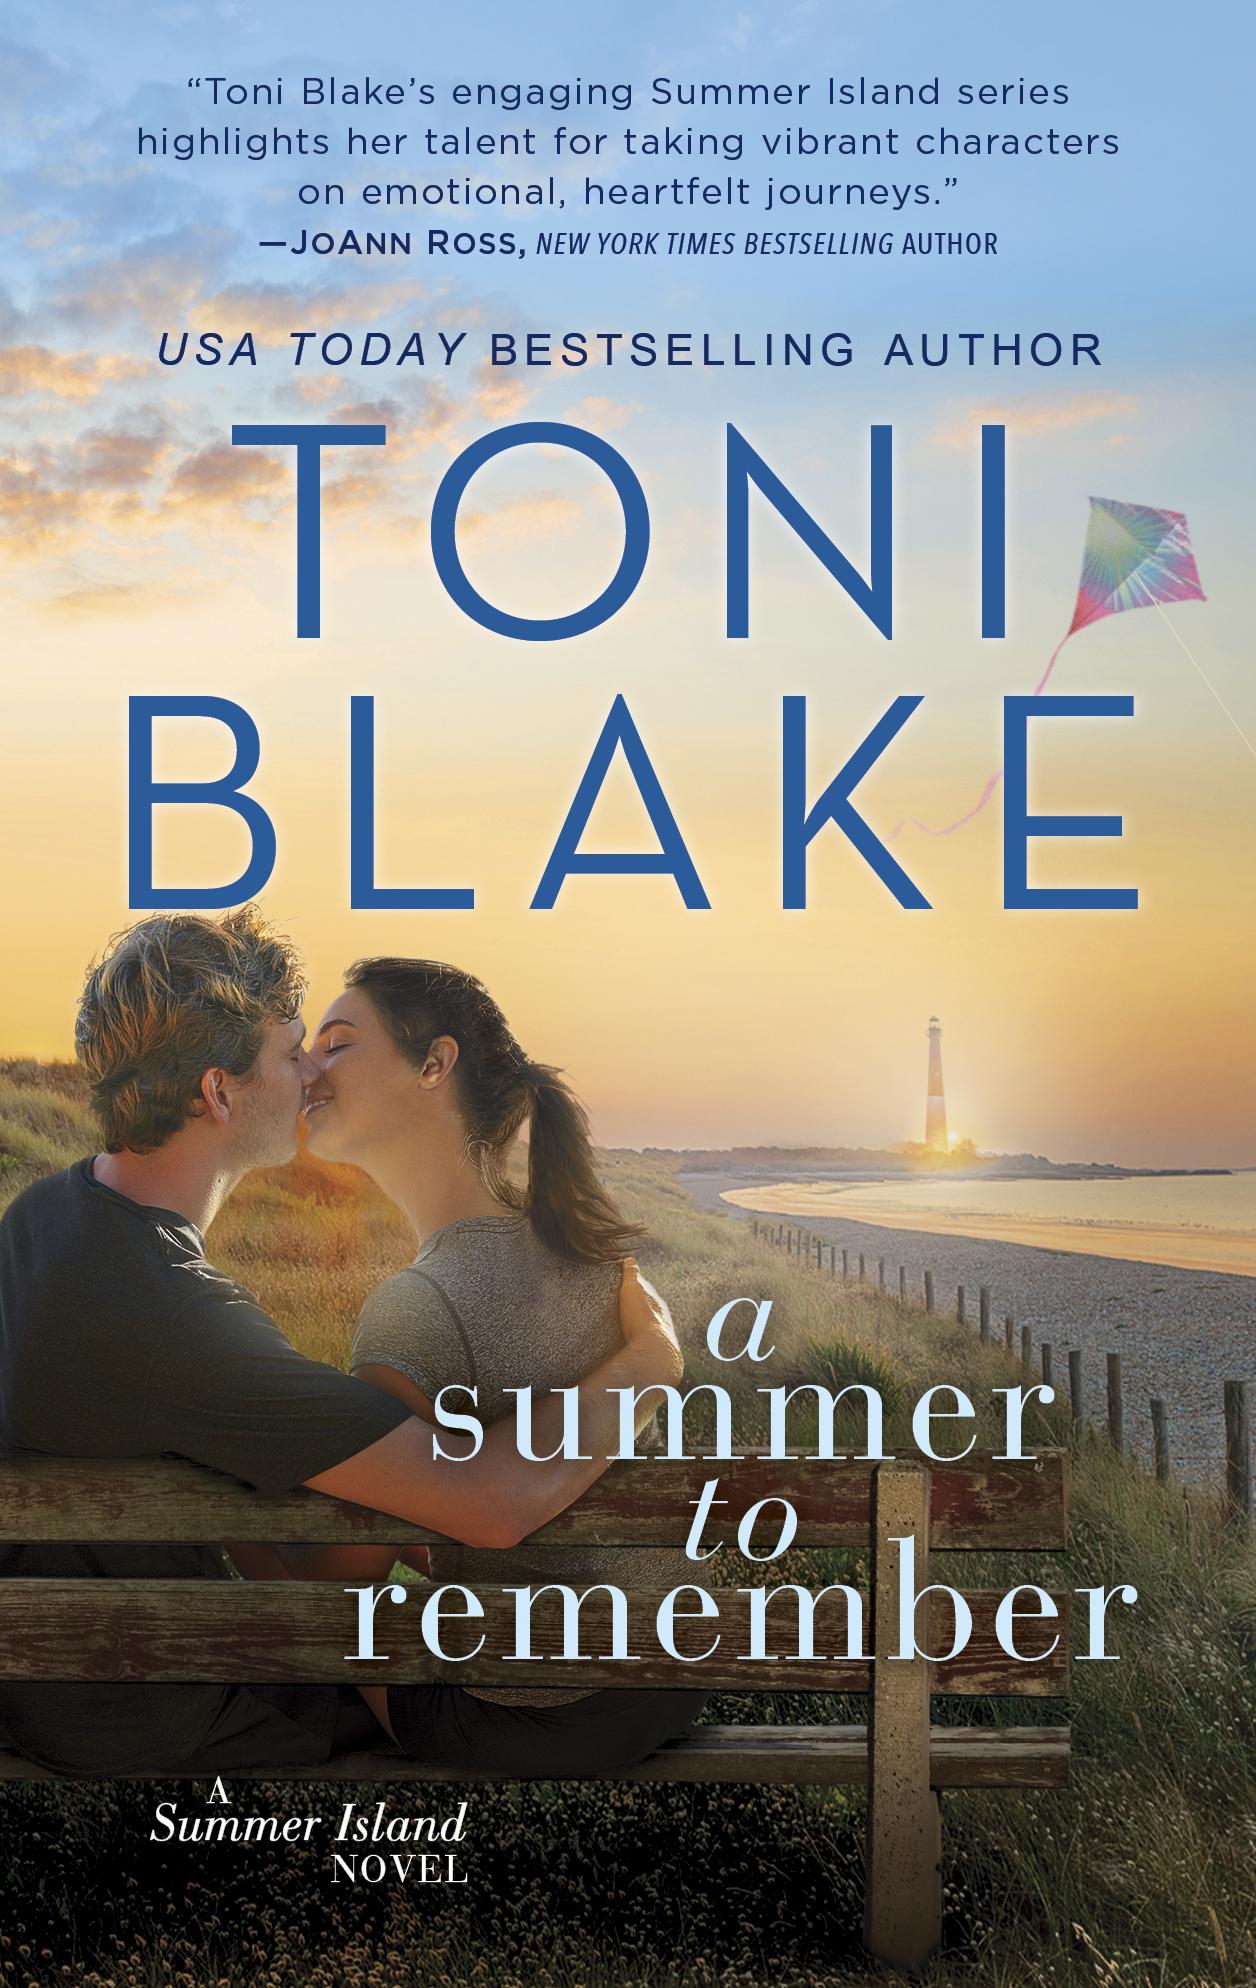 A Summer Island prequel